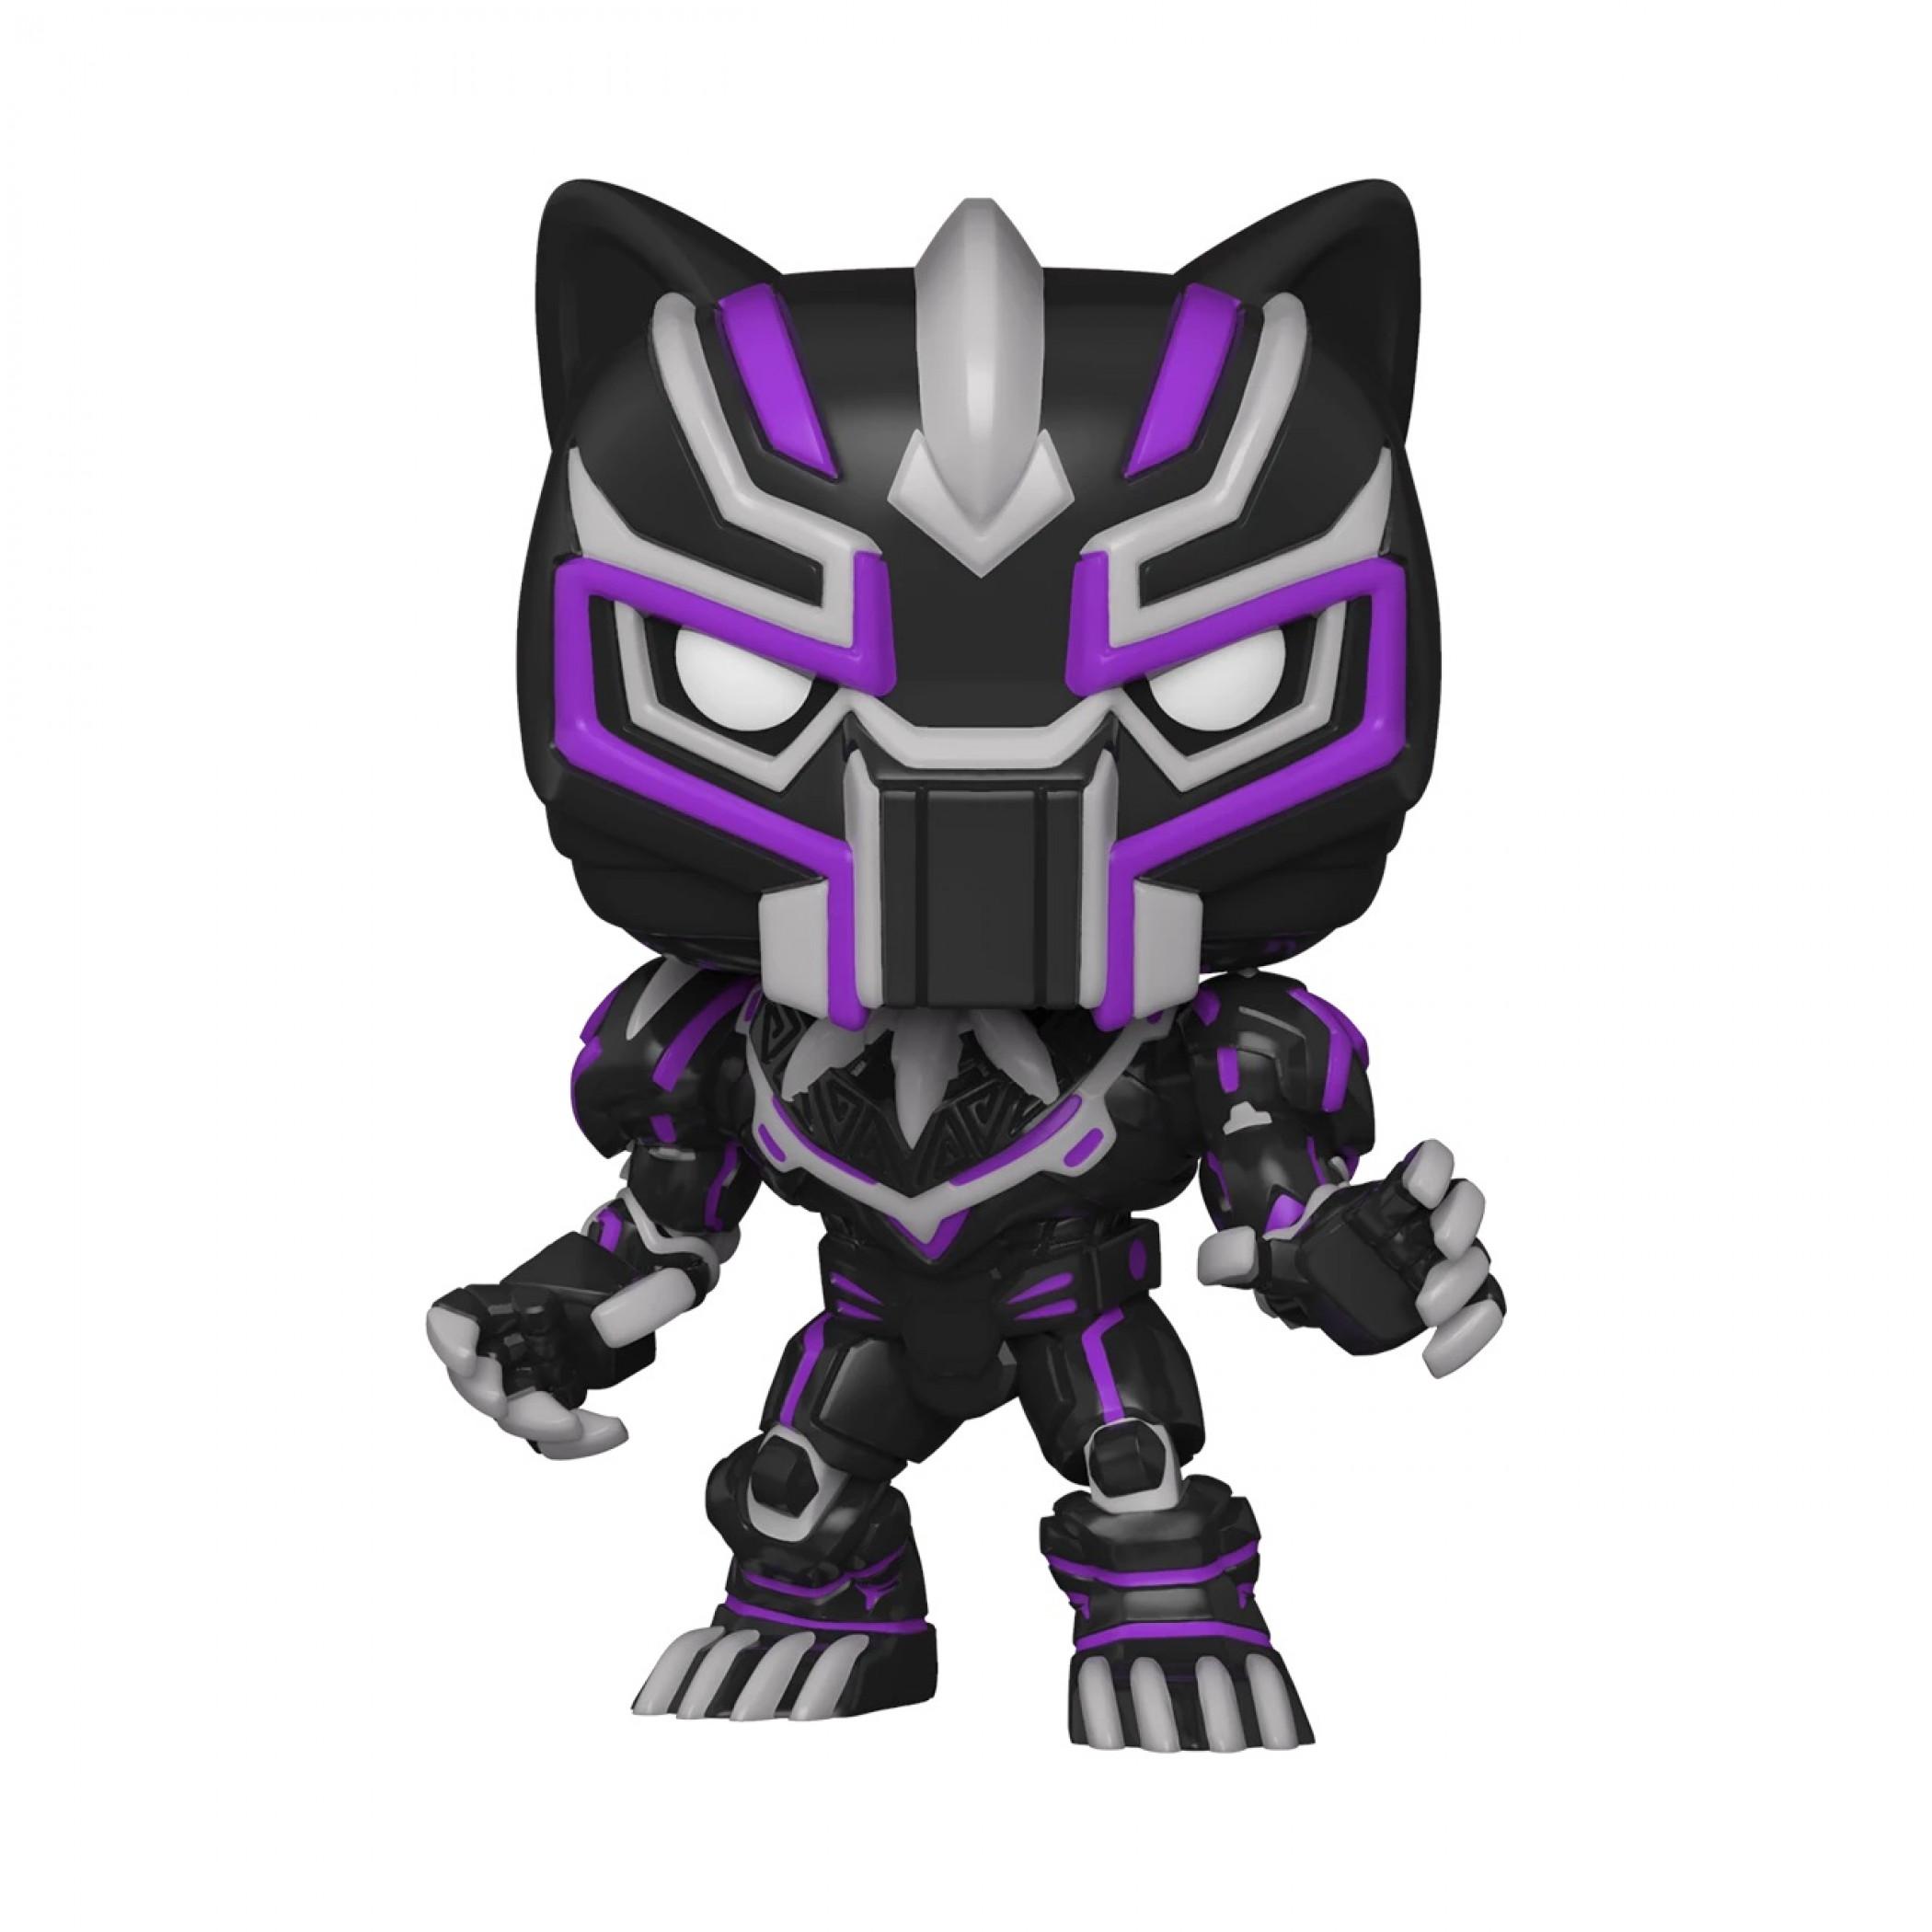 Black Panther Marvel Marvel Mech Funko Pop! Vinyl Figure